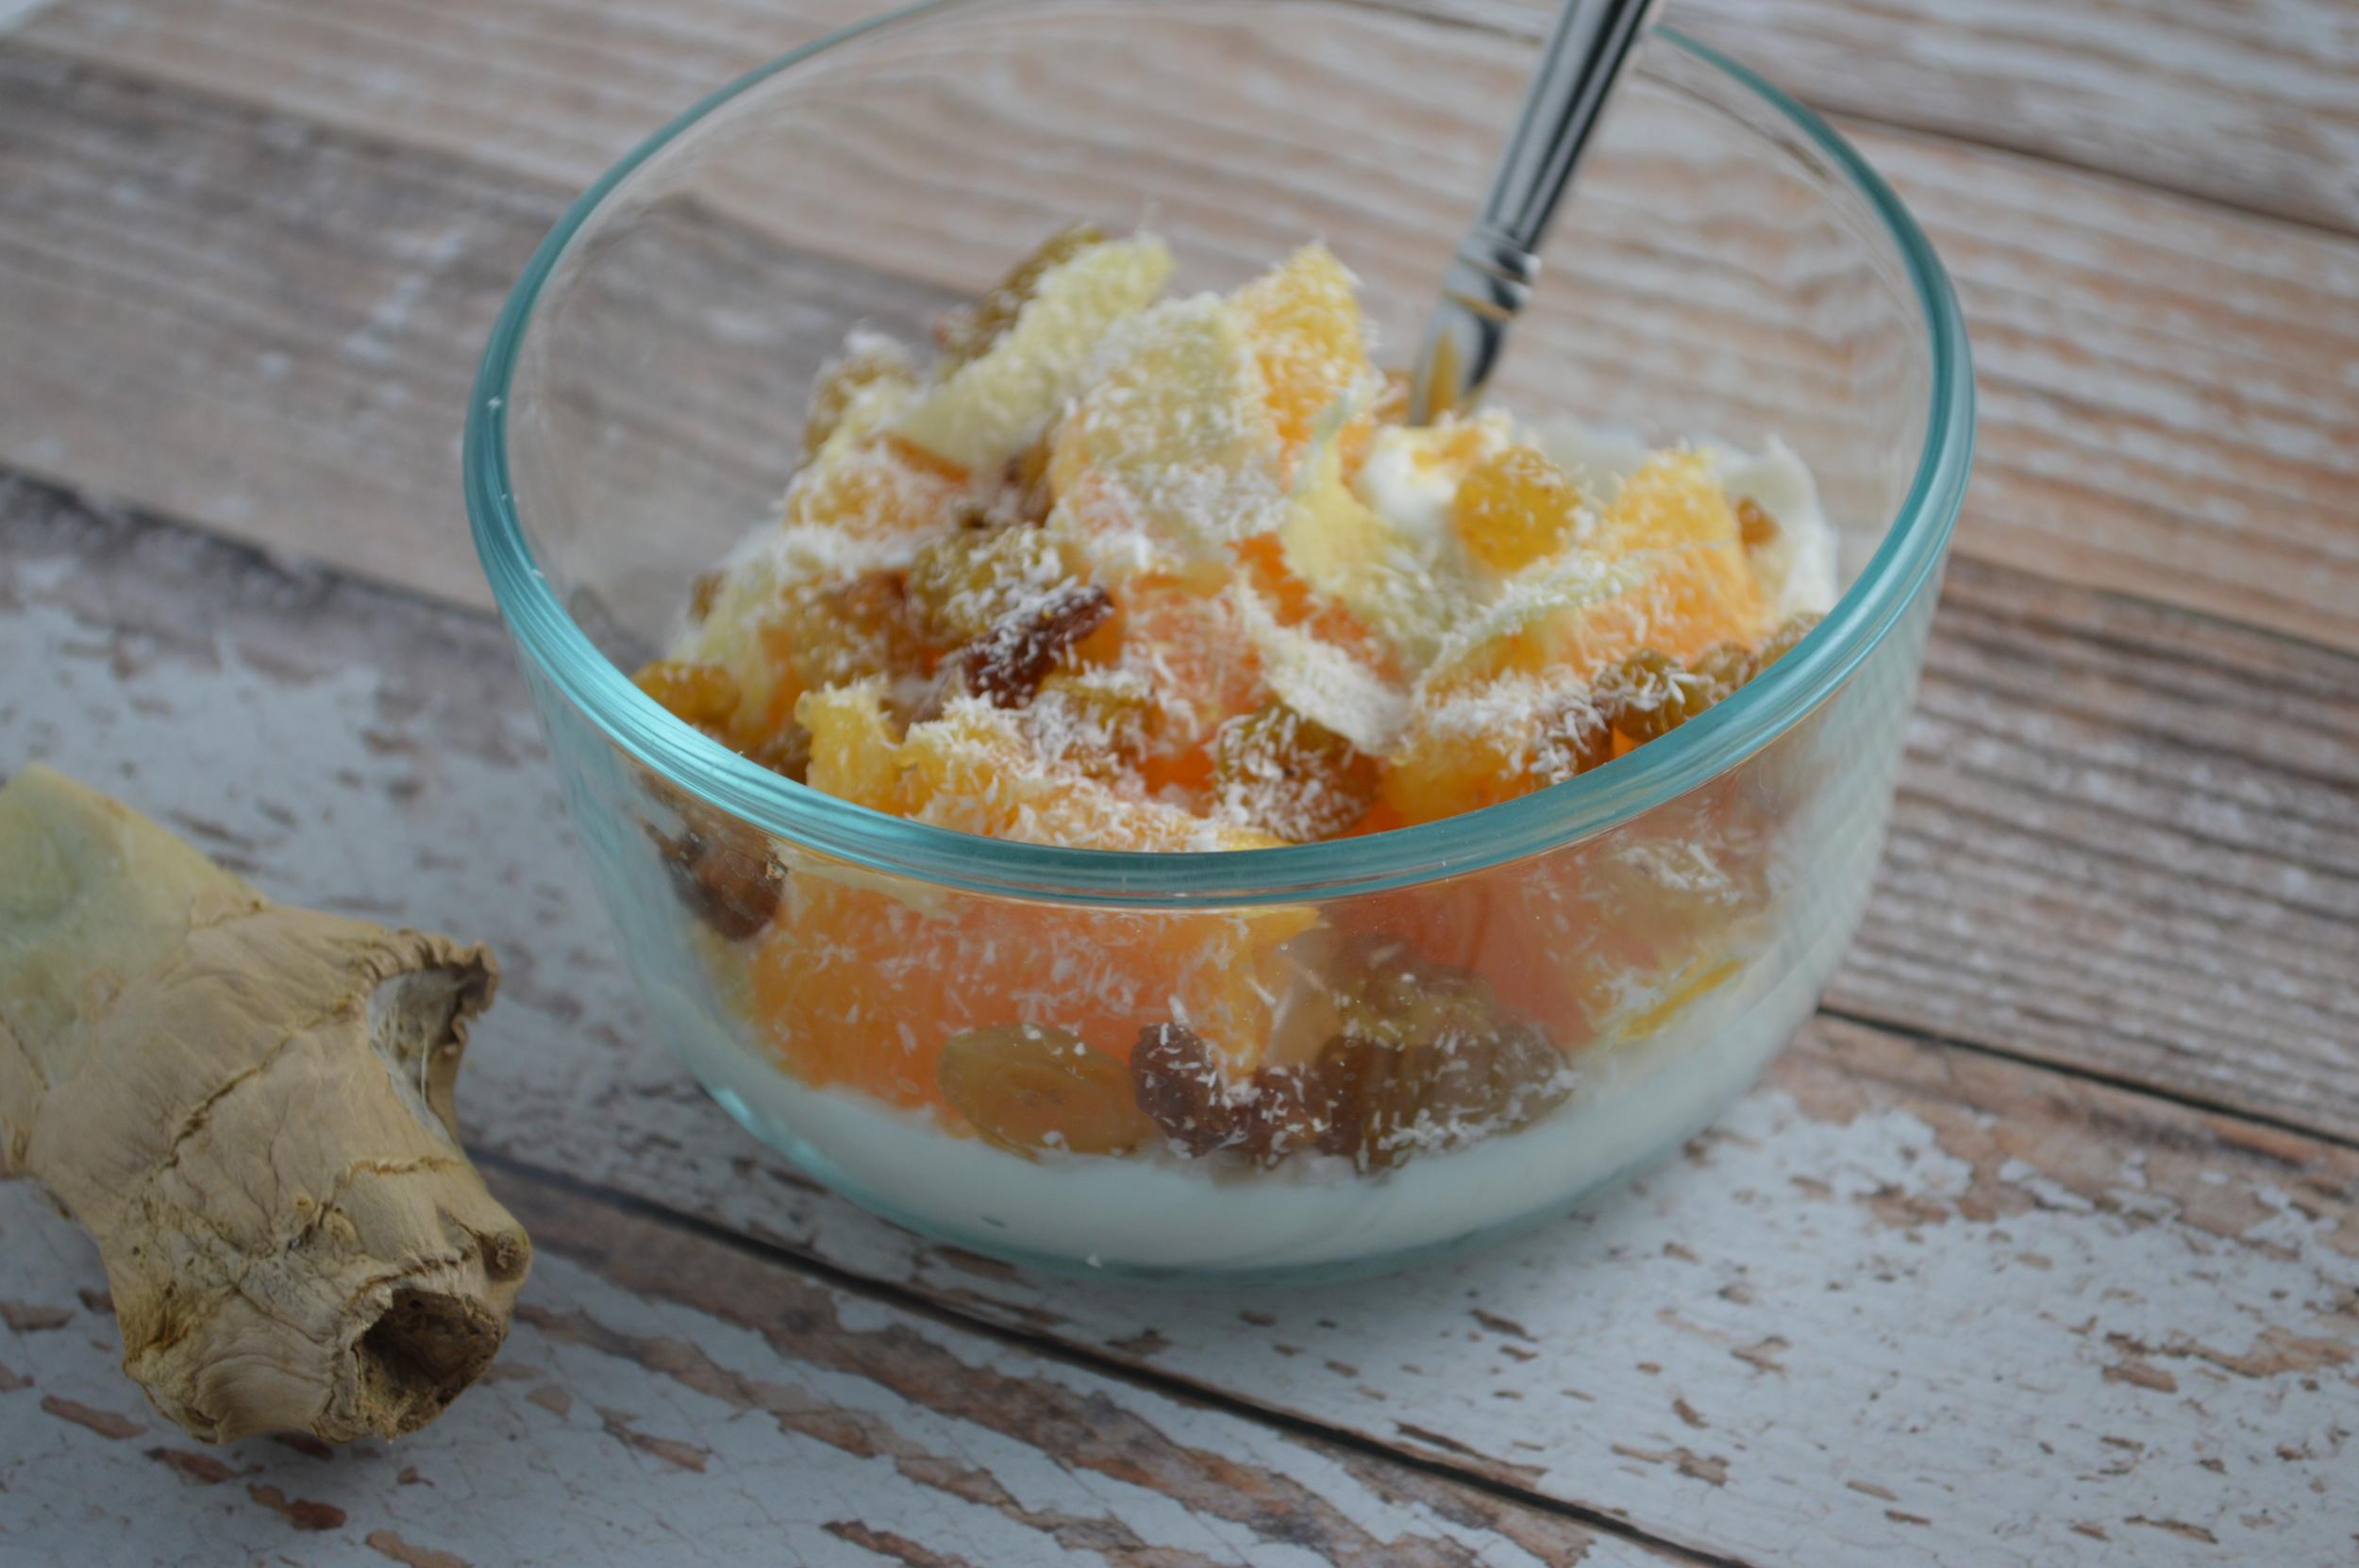 Orange Ginger Yogurt Bowl layered with Siggi's Orange & Ginger Yogurt